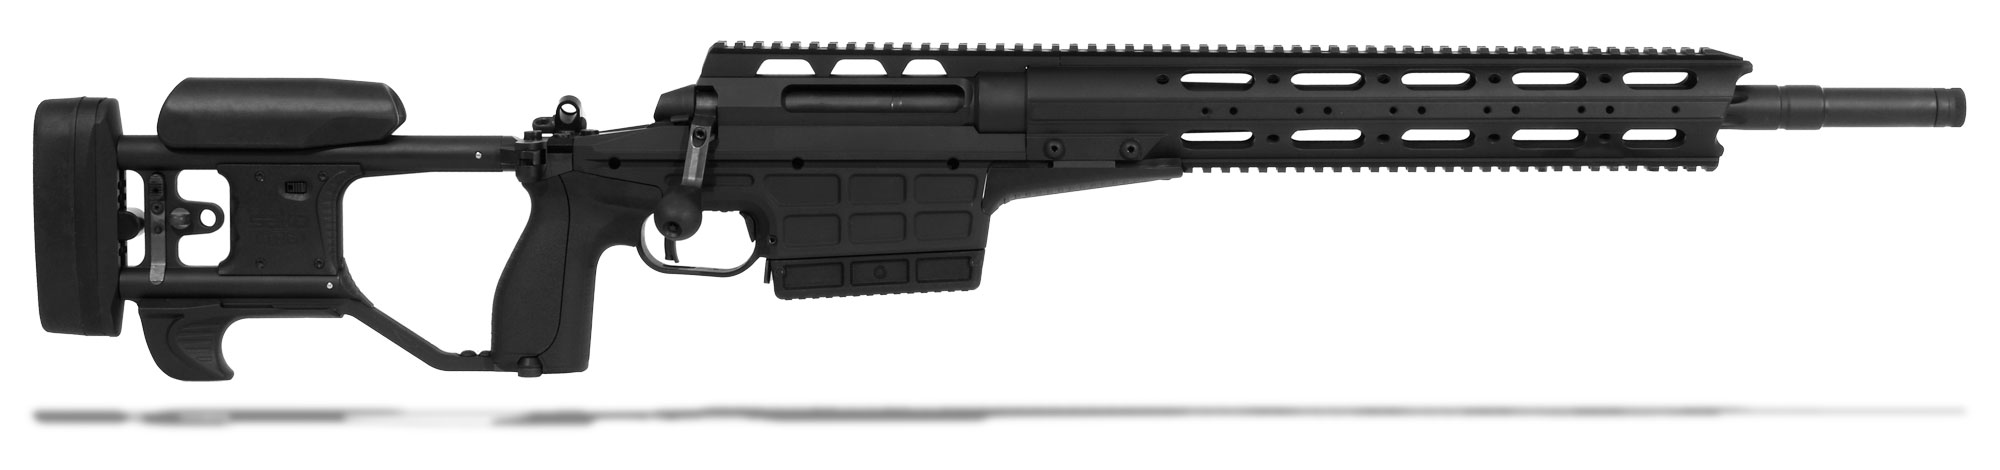 Sako TRG M10 .308 Win Black JRS321RBL2